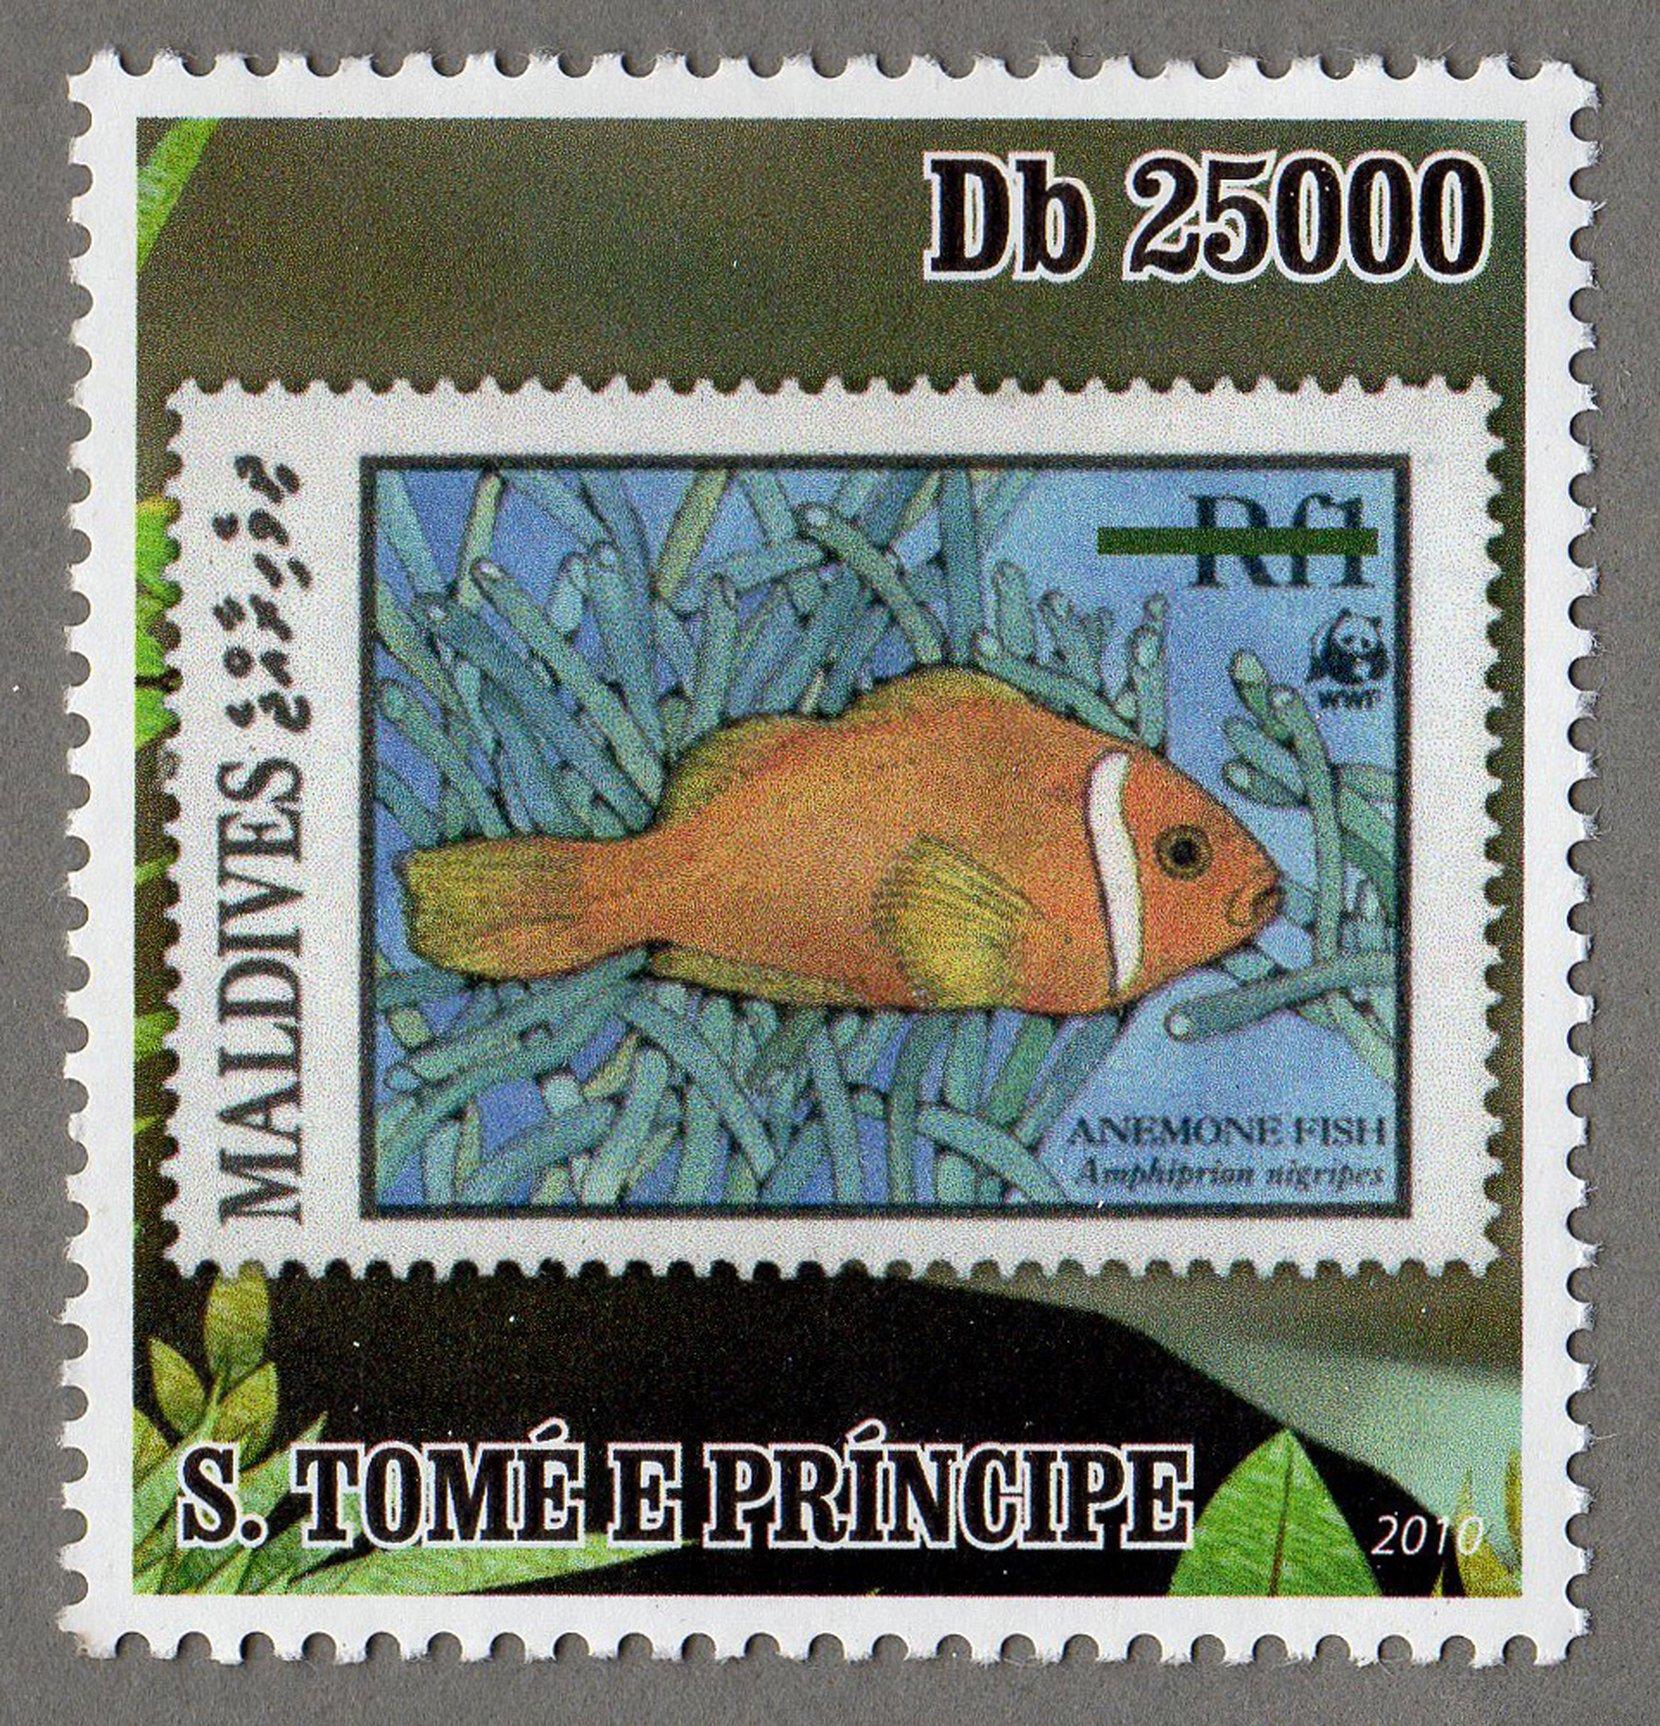 maldives – anemone fish s.tome e principe stamp (3) philately postage stamps